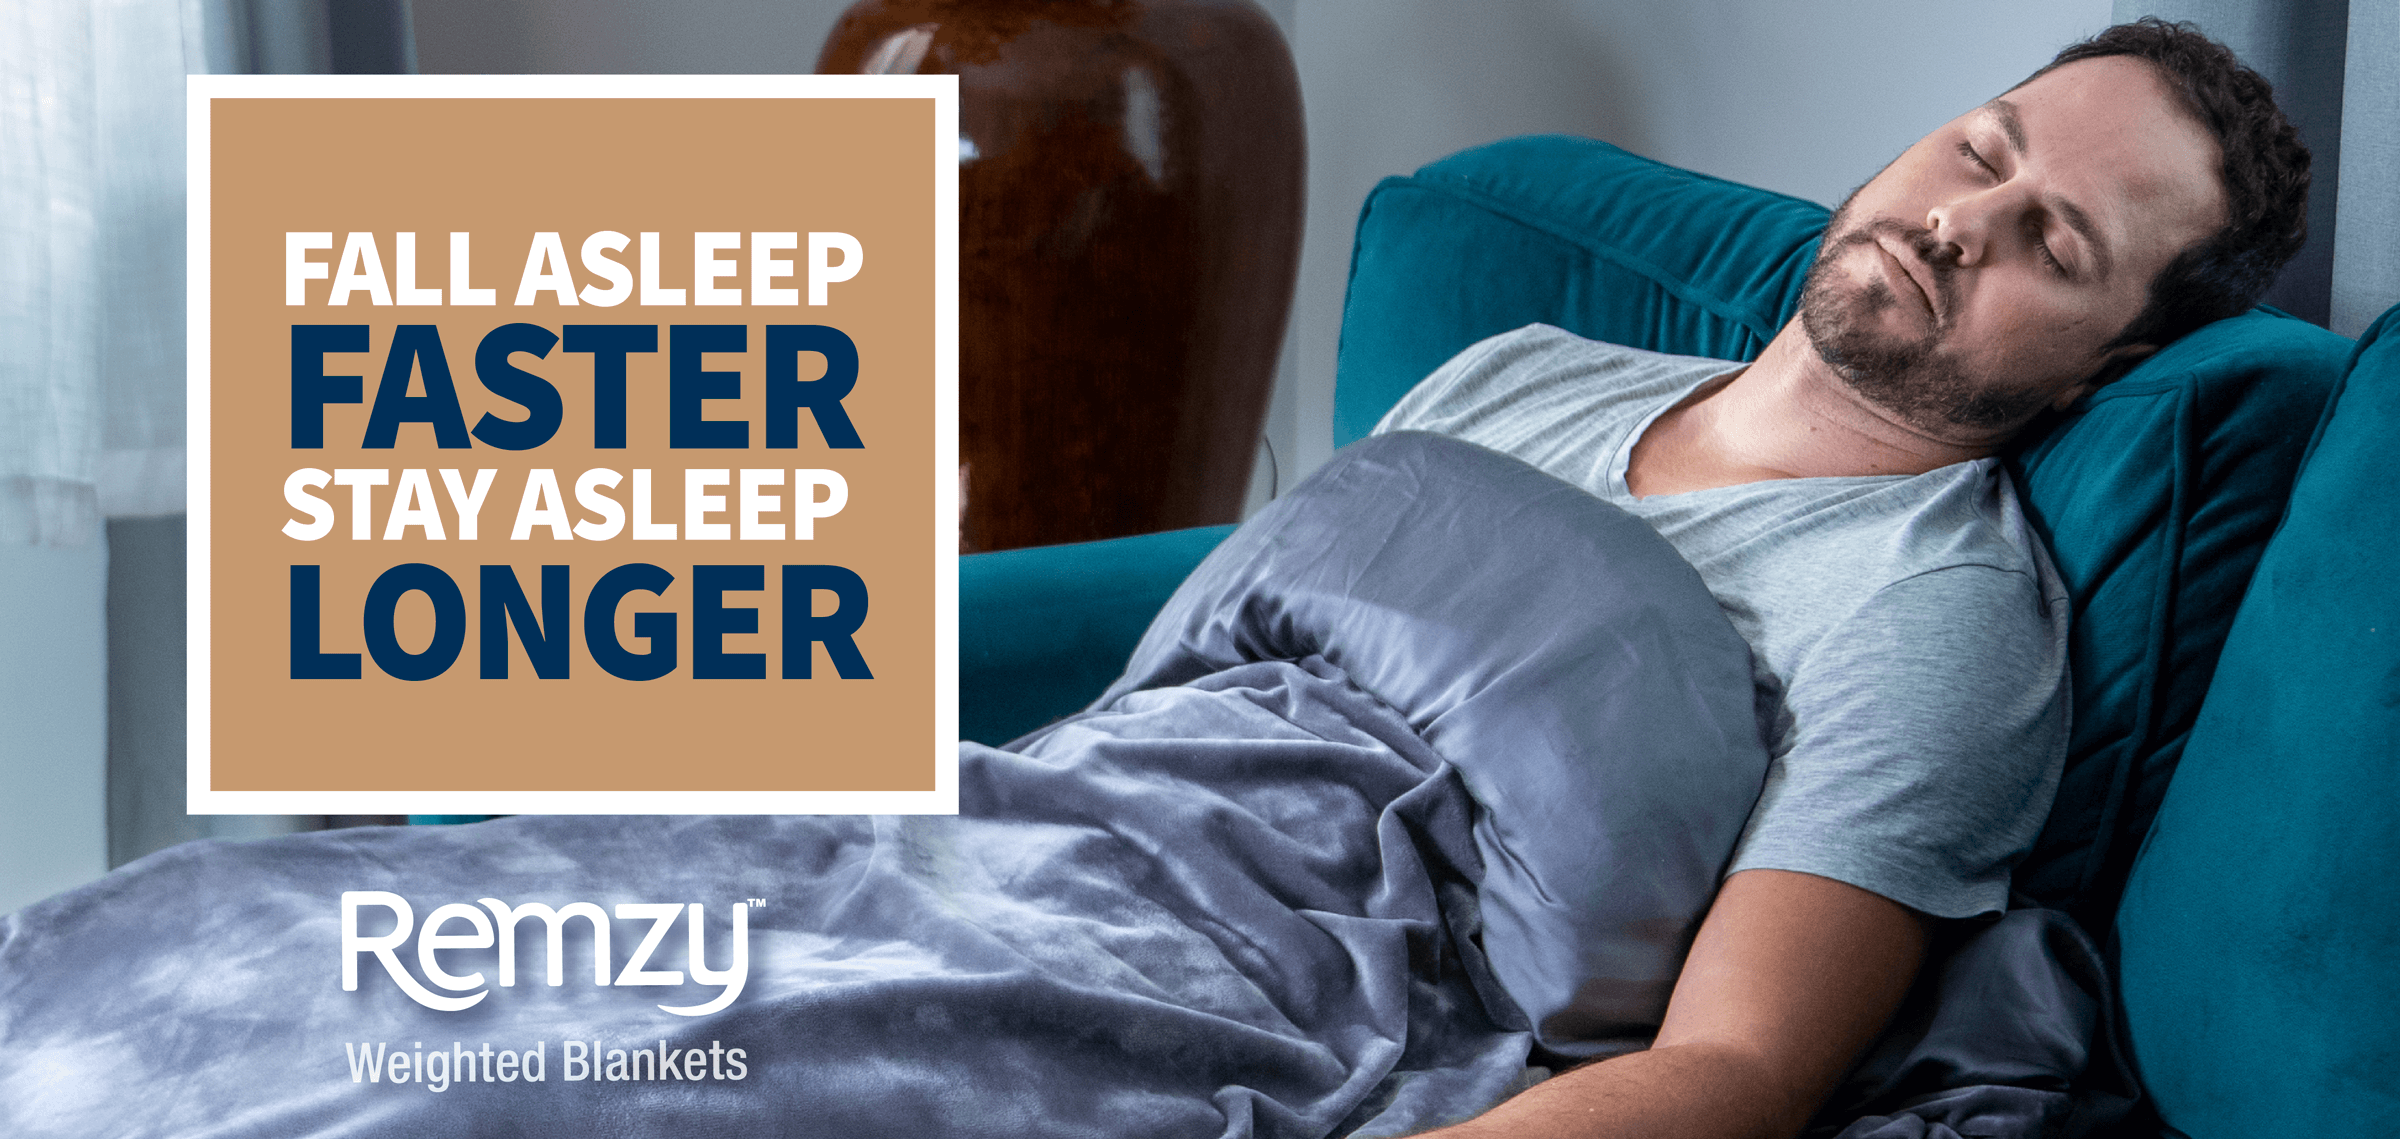 Fall Asleep Faster Stay Asleep Longer